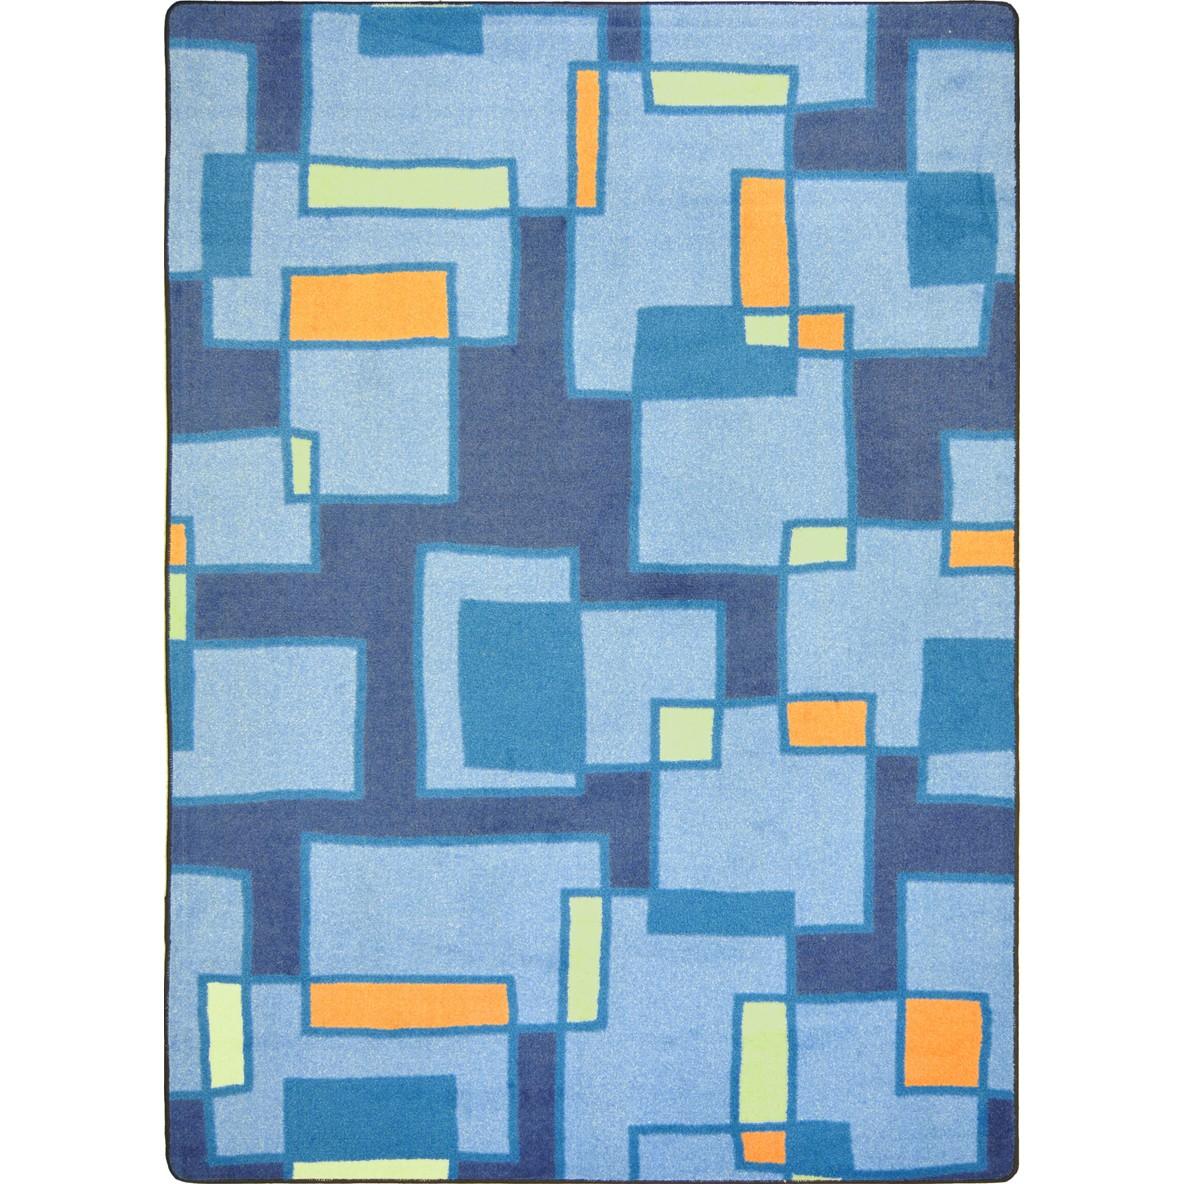 "Joy Rugs Outside the Box Machine Tufted - Cut Pile Cool Blue 3'10"" x 5'4"" - Area Rug"